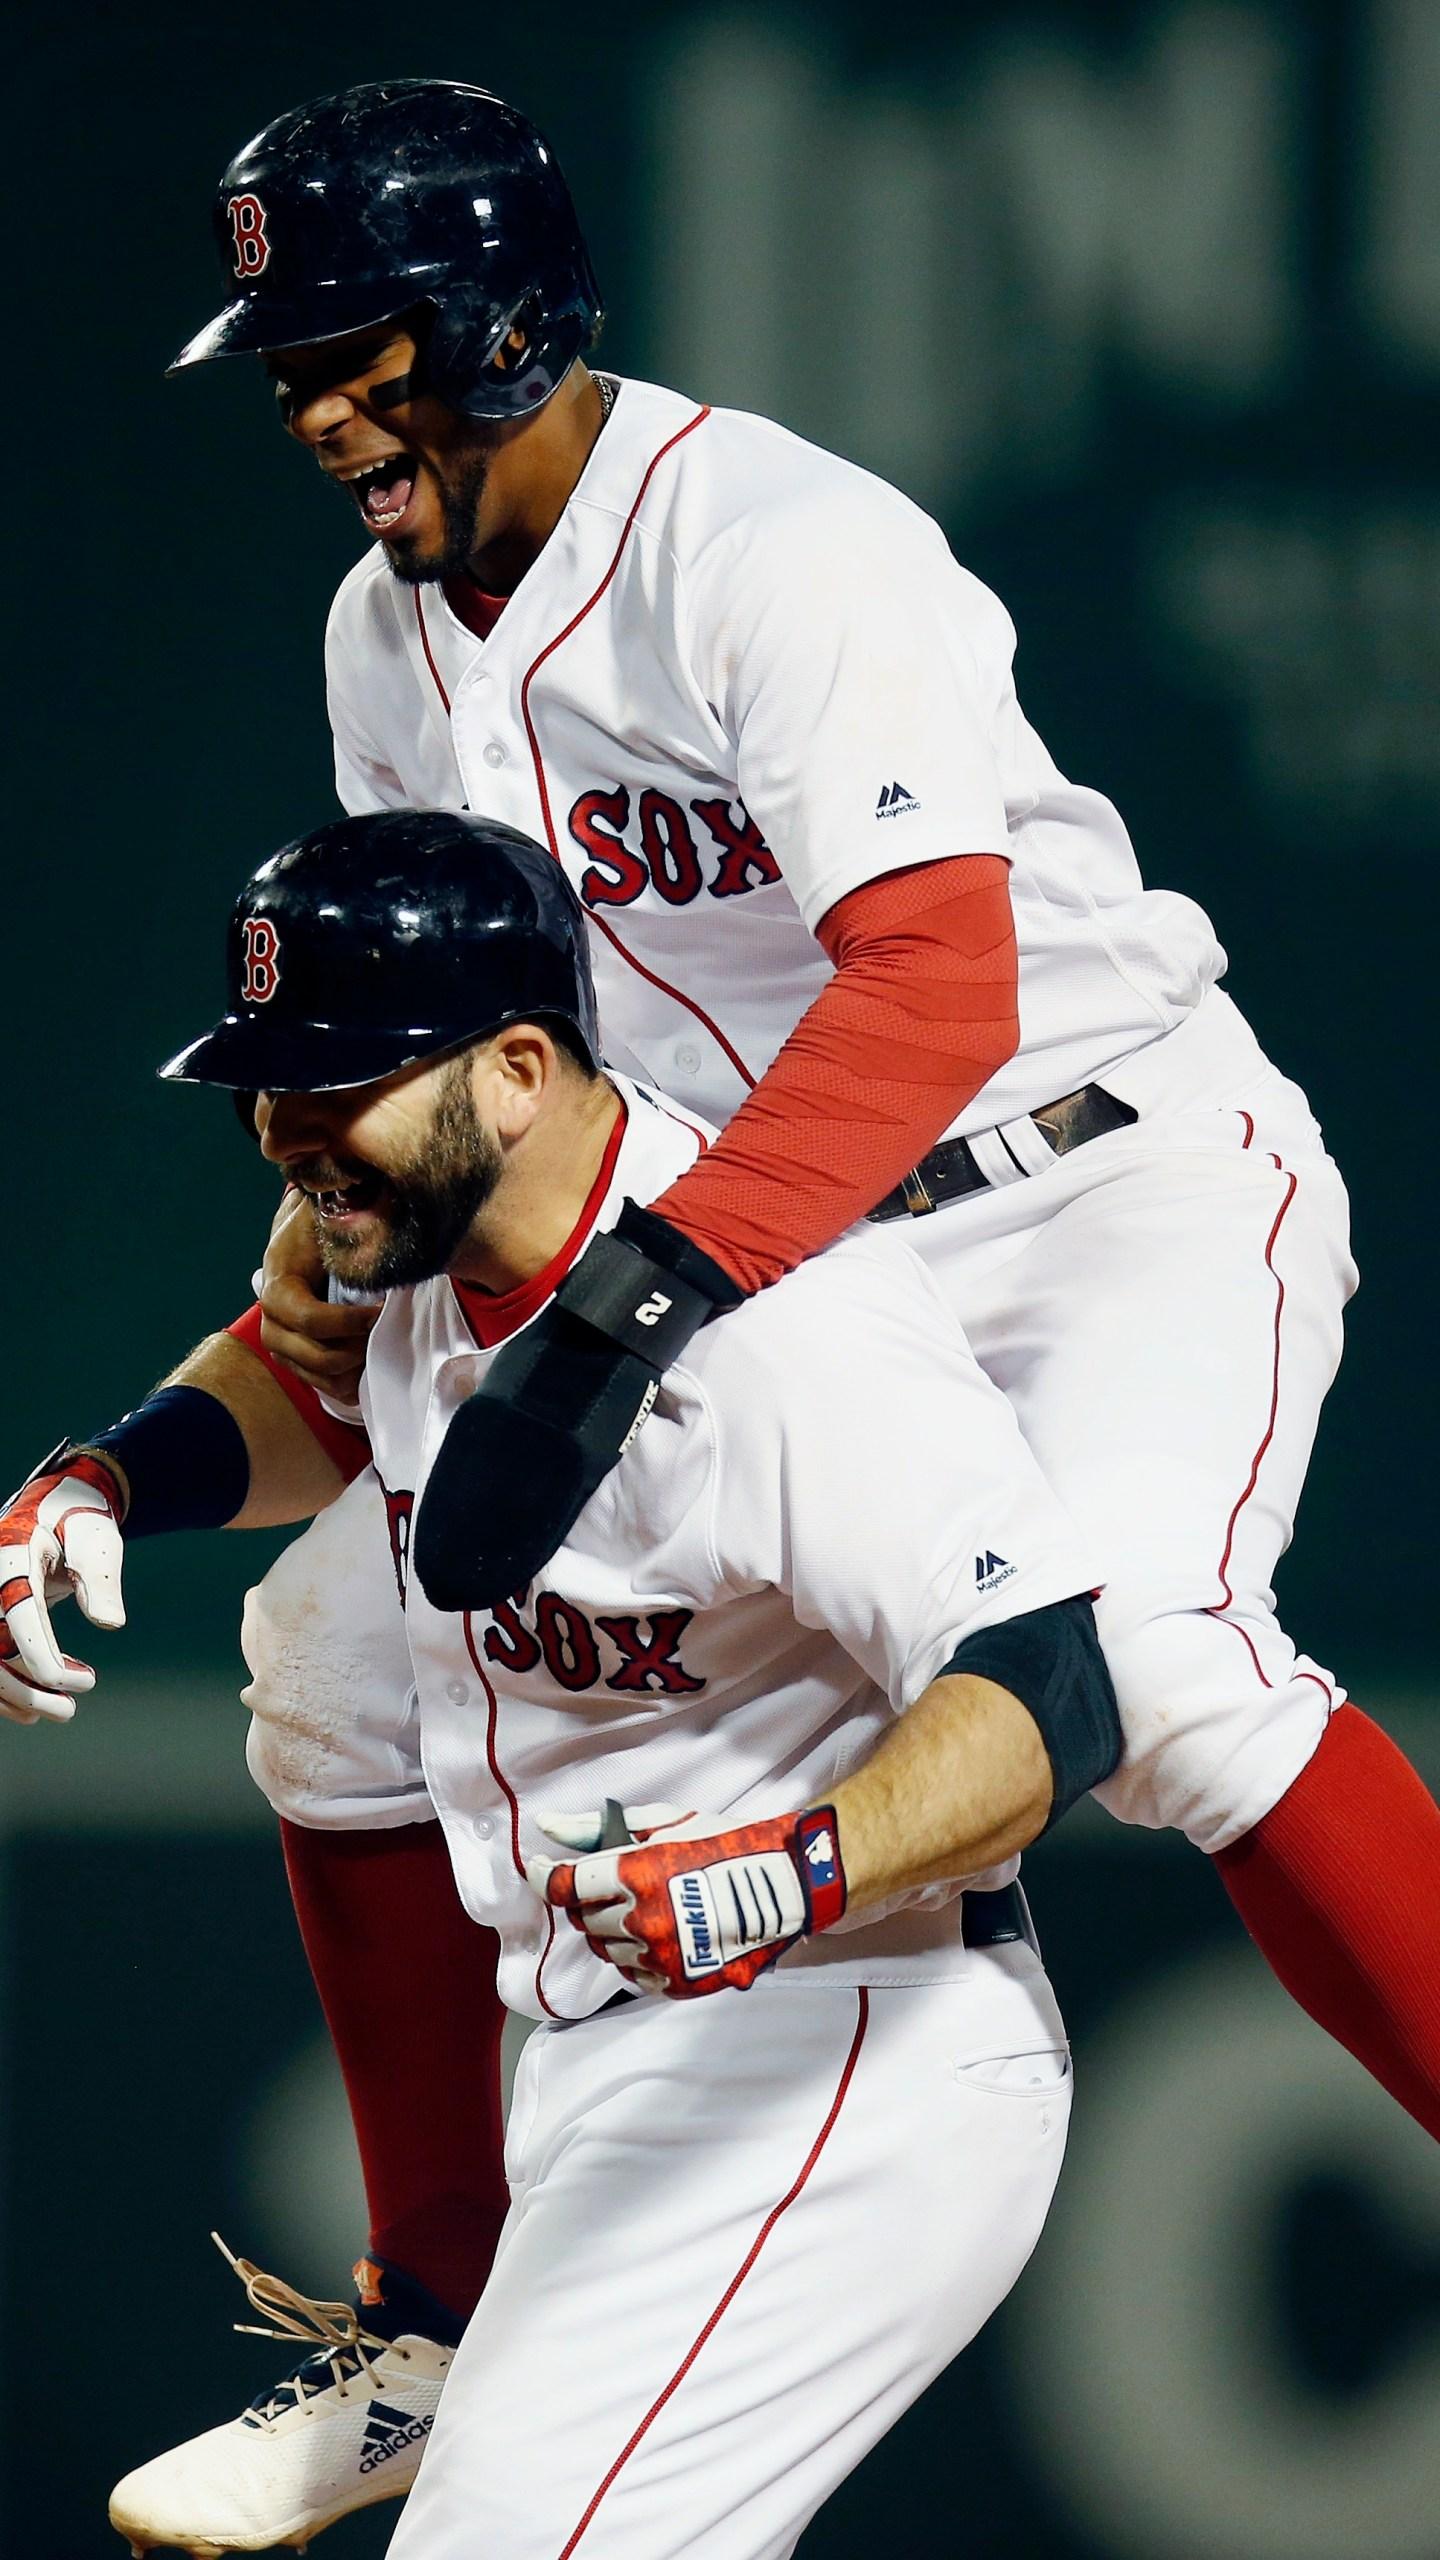 APTOPIX Astros Red Sox Baseball_1536554184203